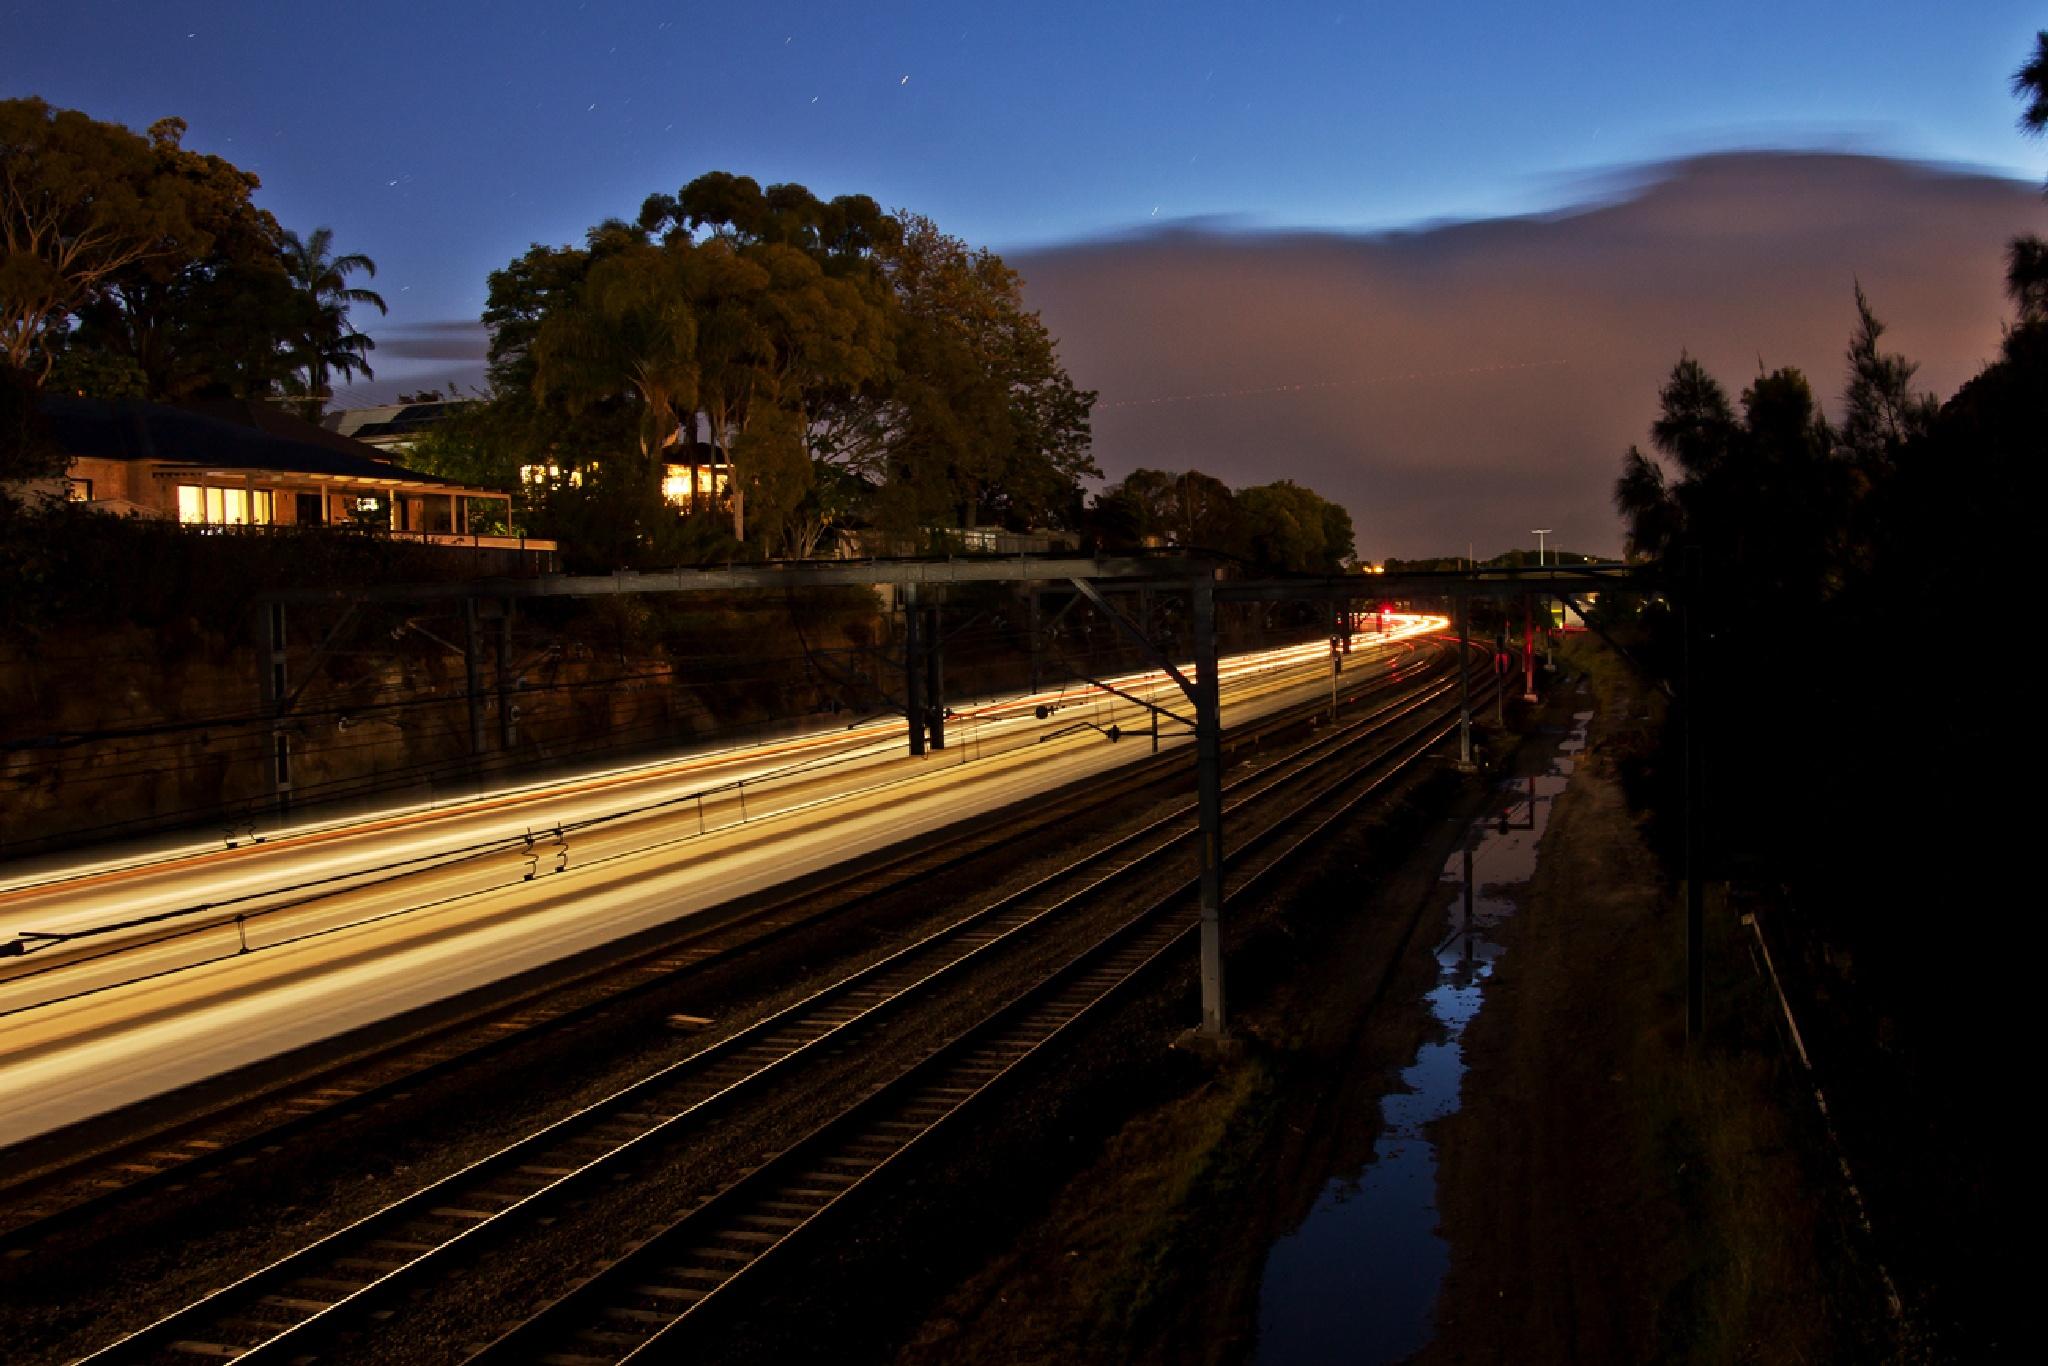 Glow Train by Doc Jones